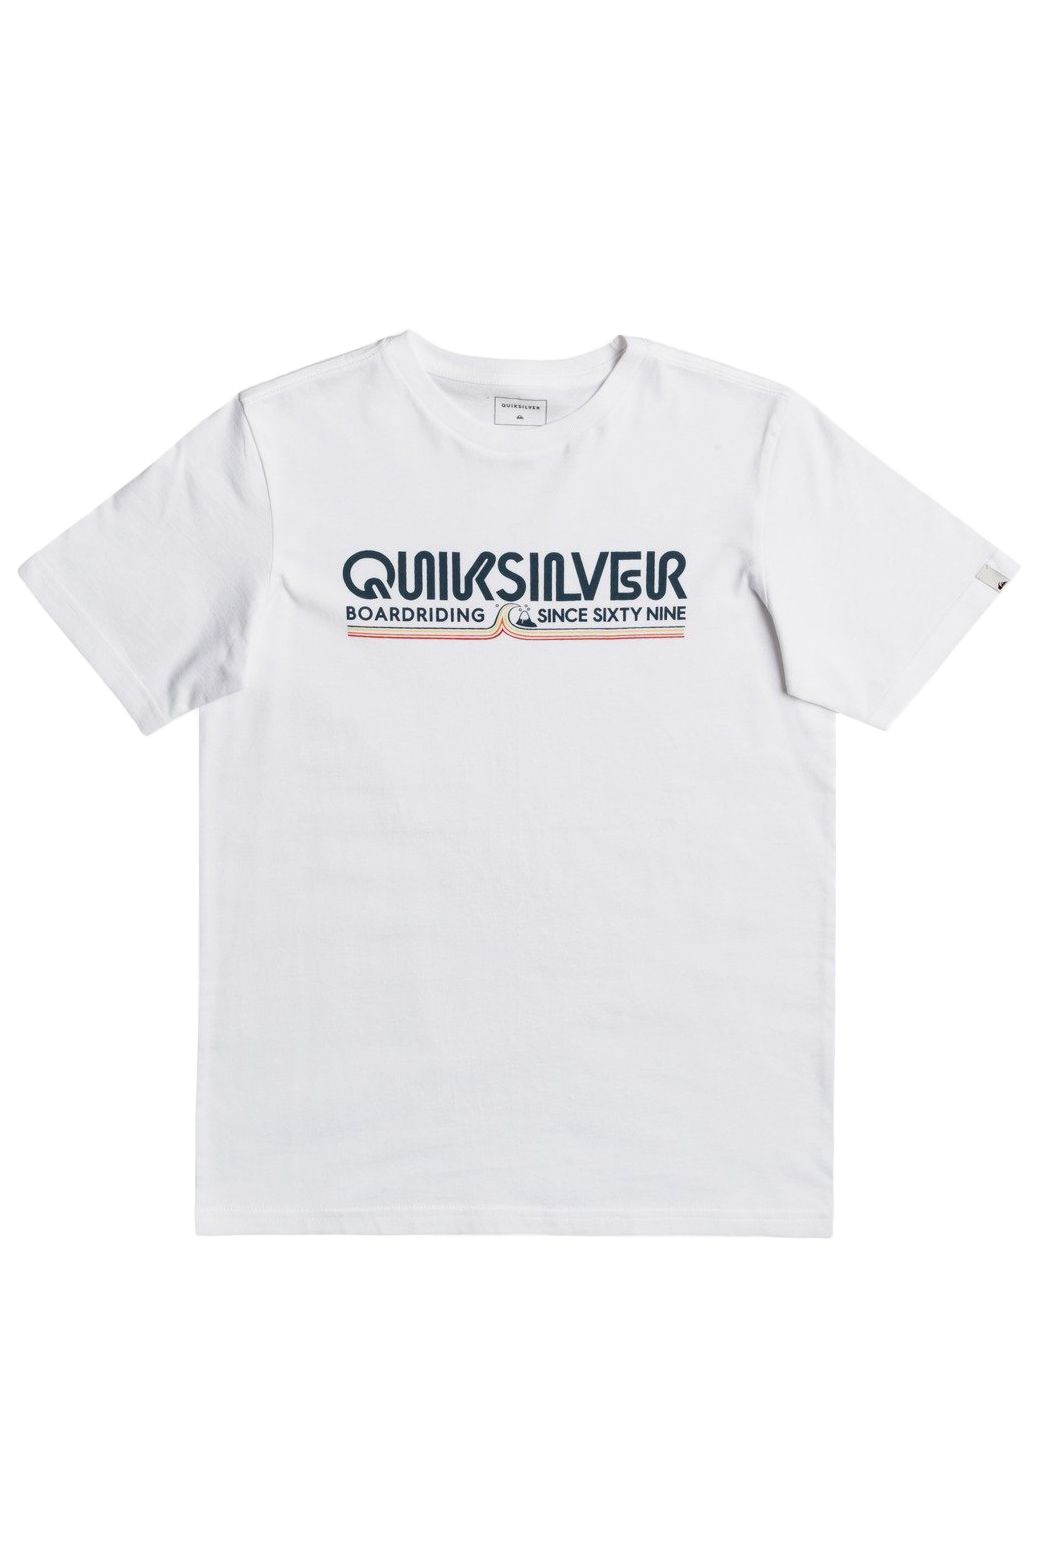 Quiksilver T-Shirt LIKE GOLD White